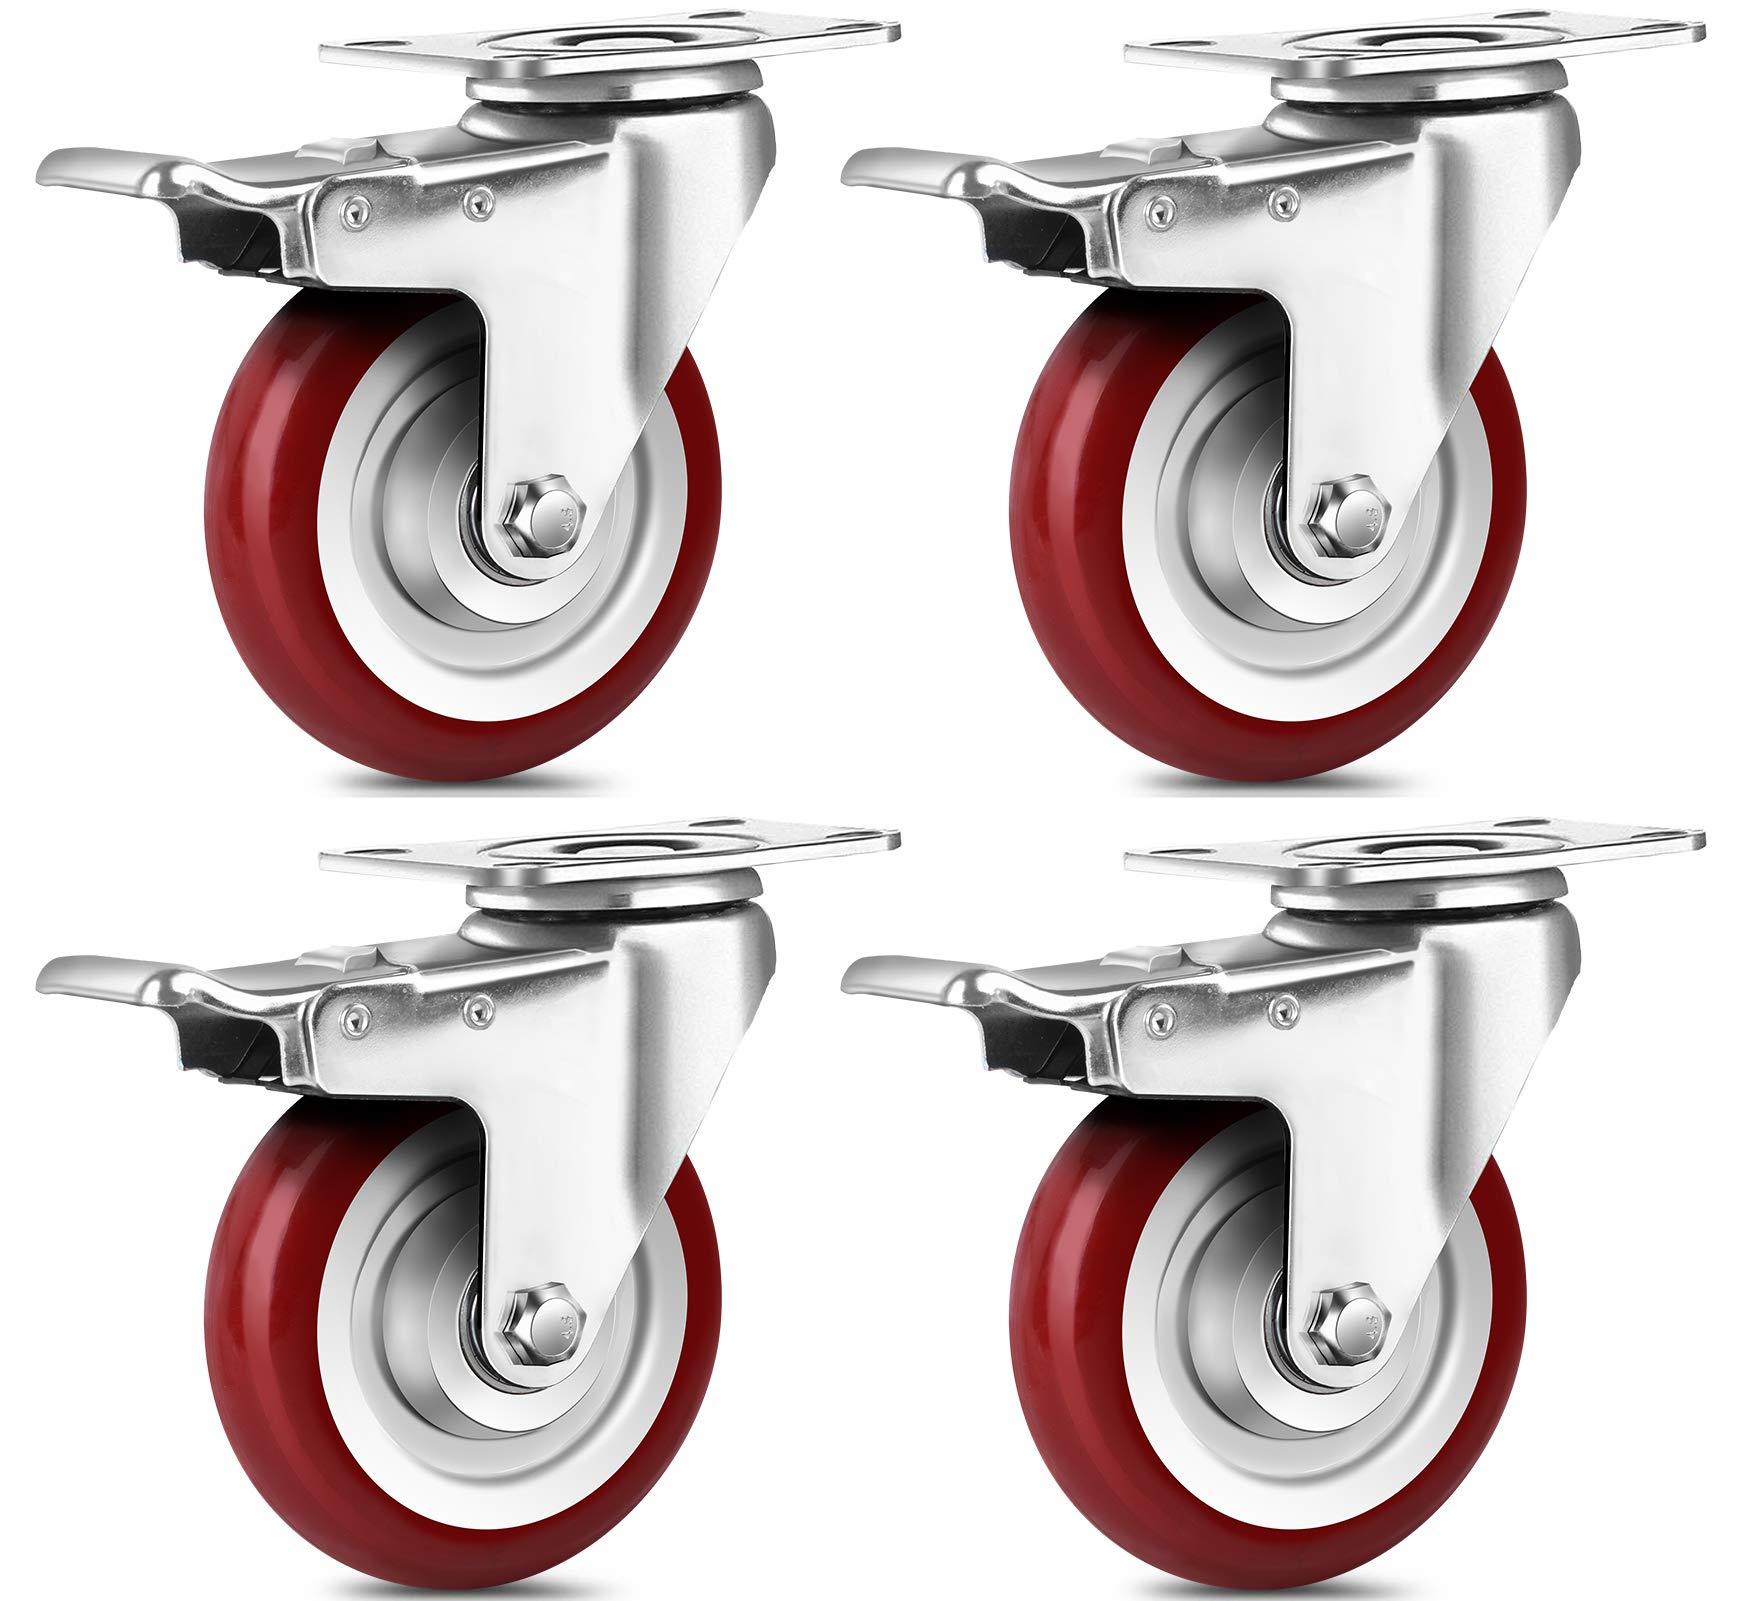 "24 LOT Swivel Plate Casters 2.5/"" Polyurethane Wheel Total Lock Brake ALL BLACK"